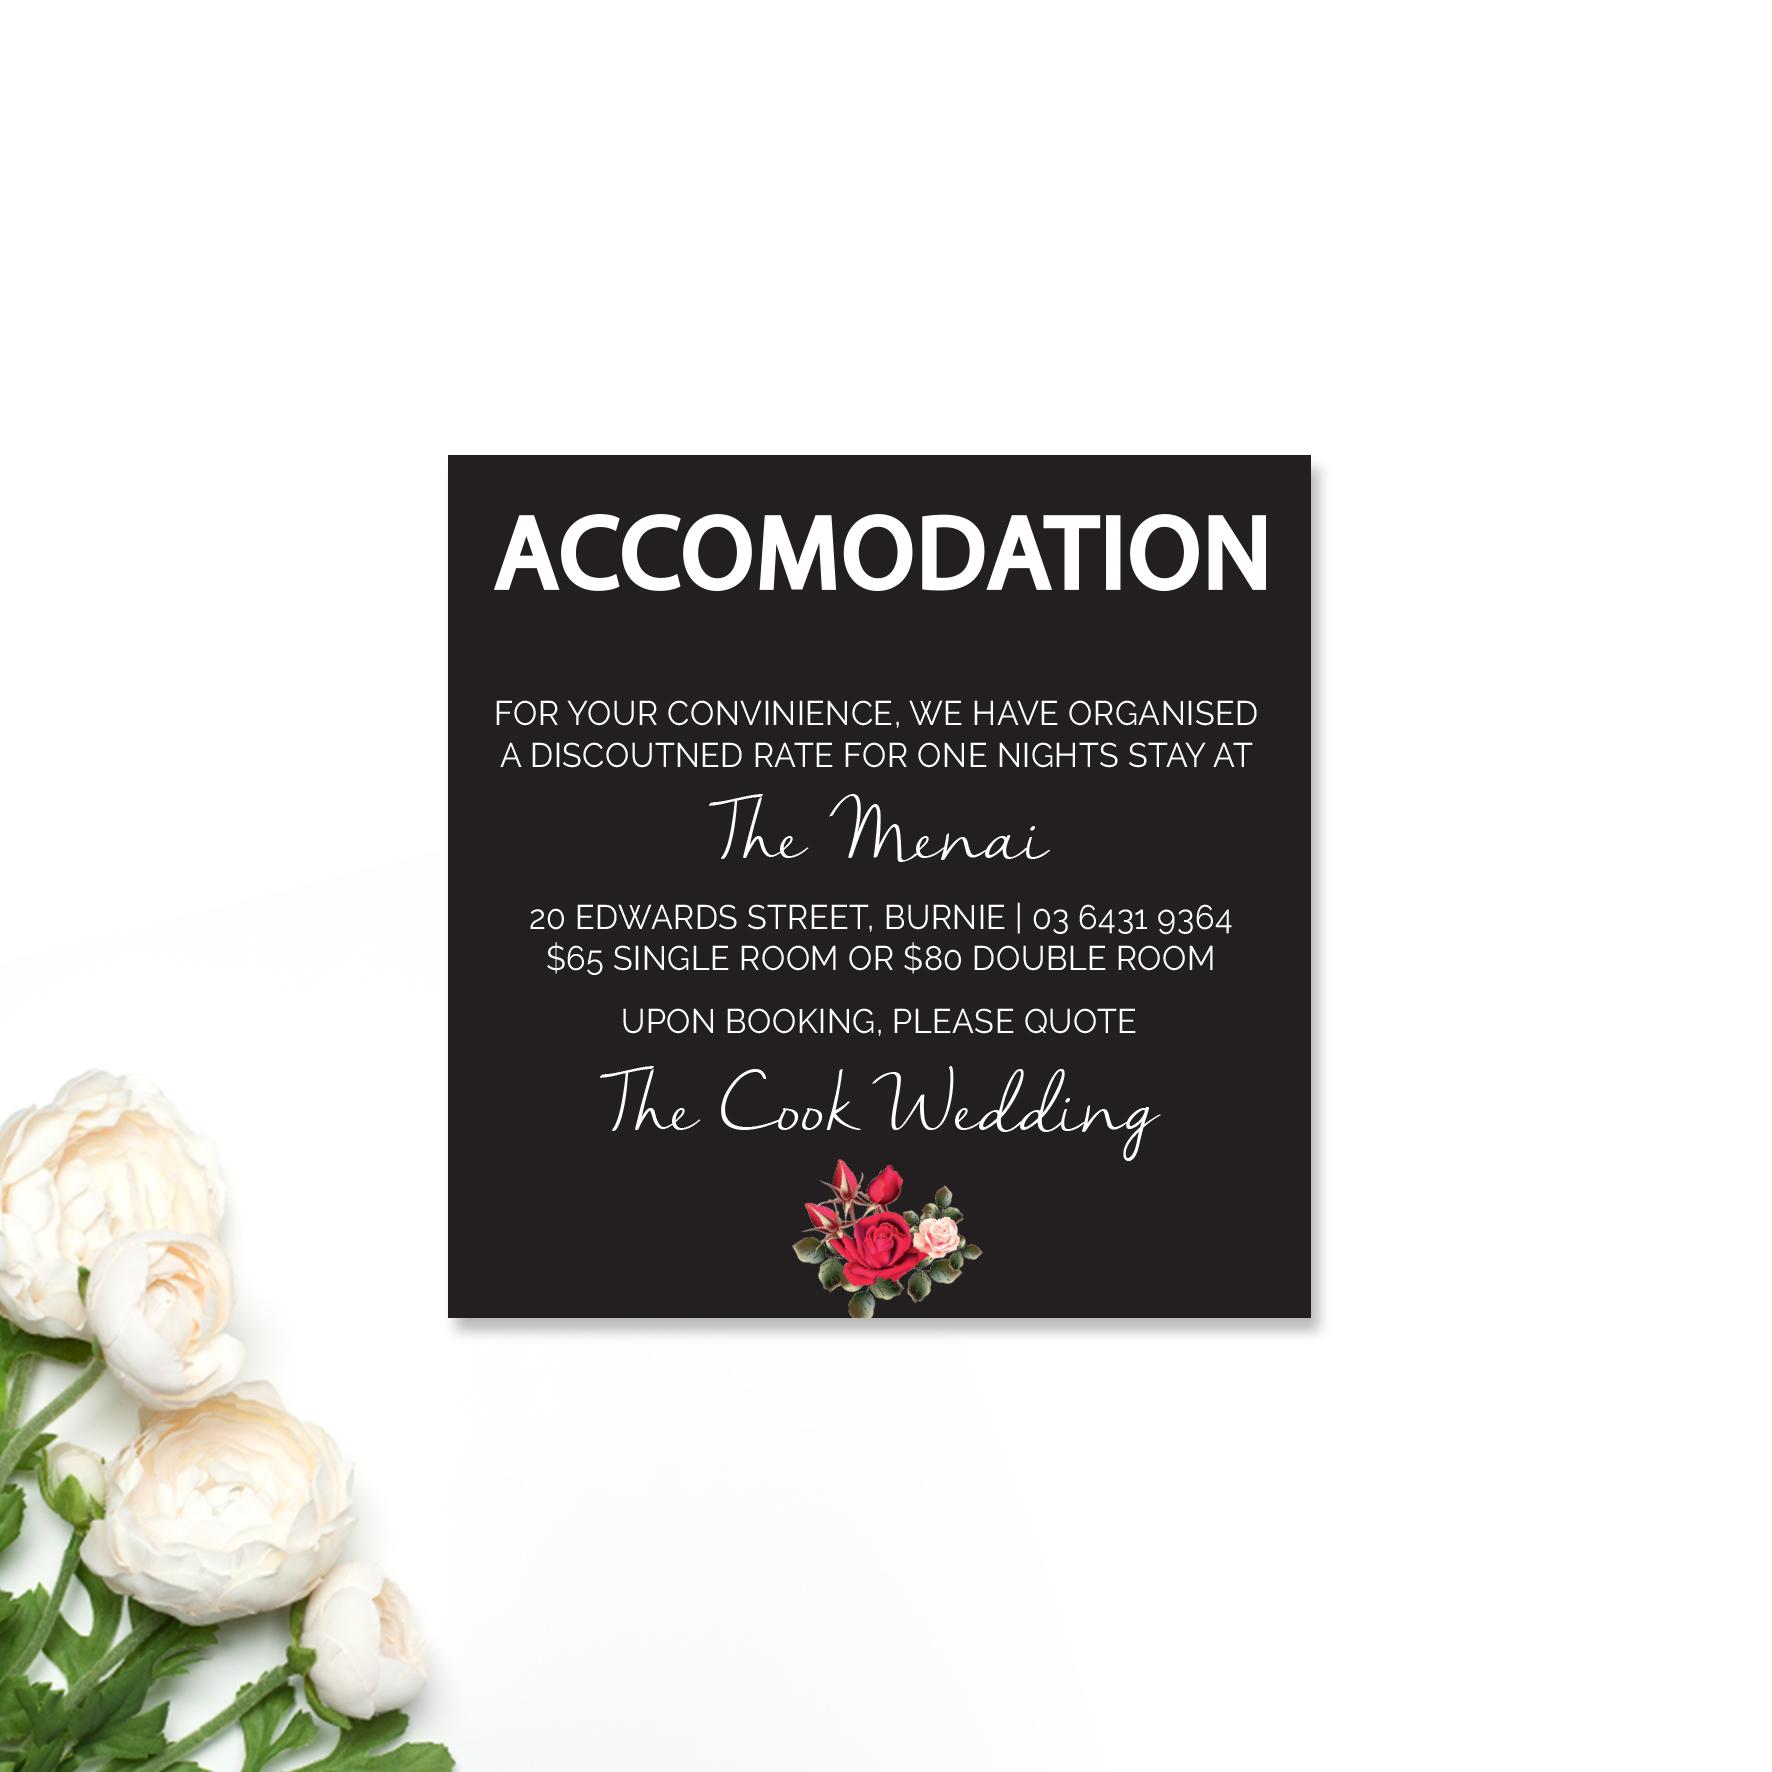 Louise + Simon Accomodation Card